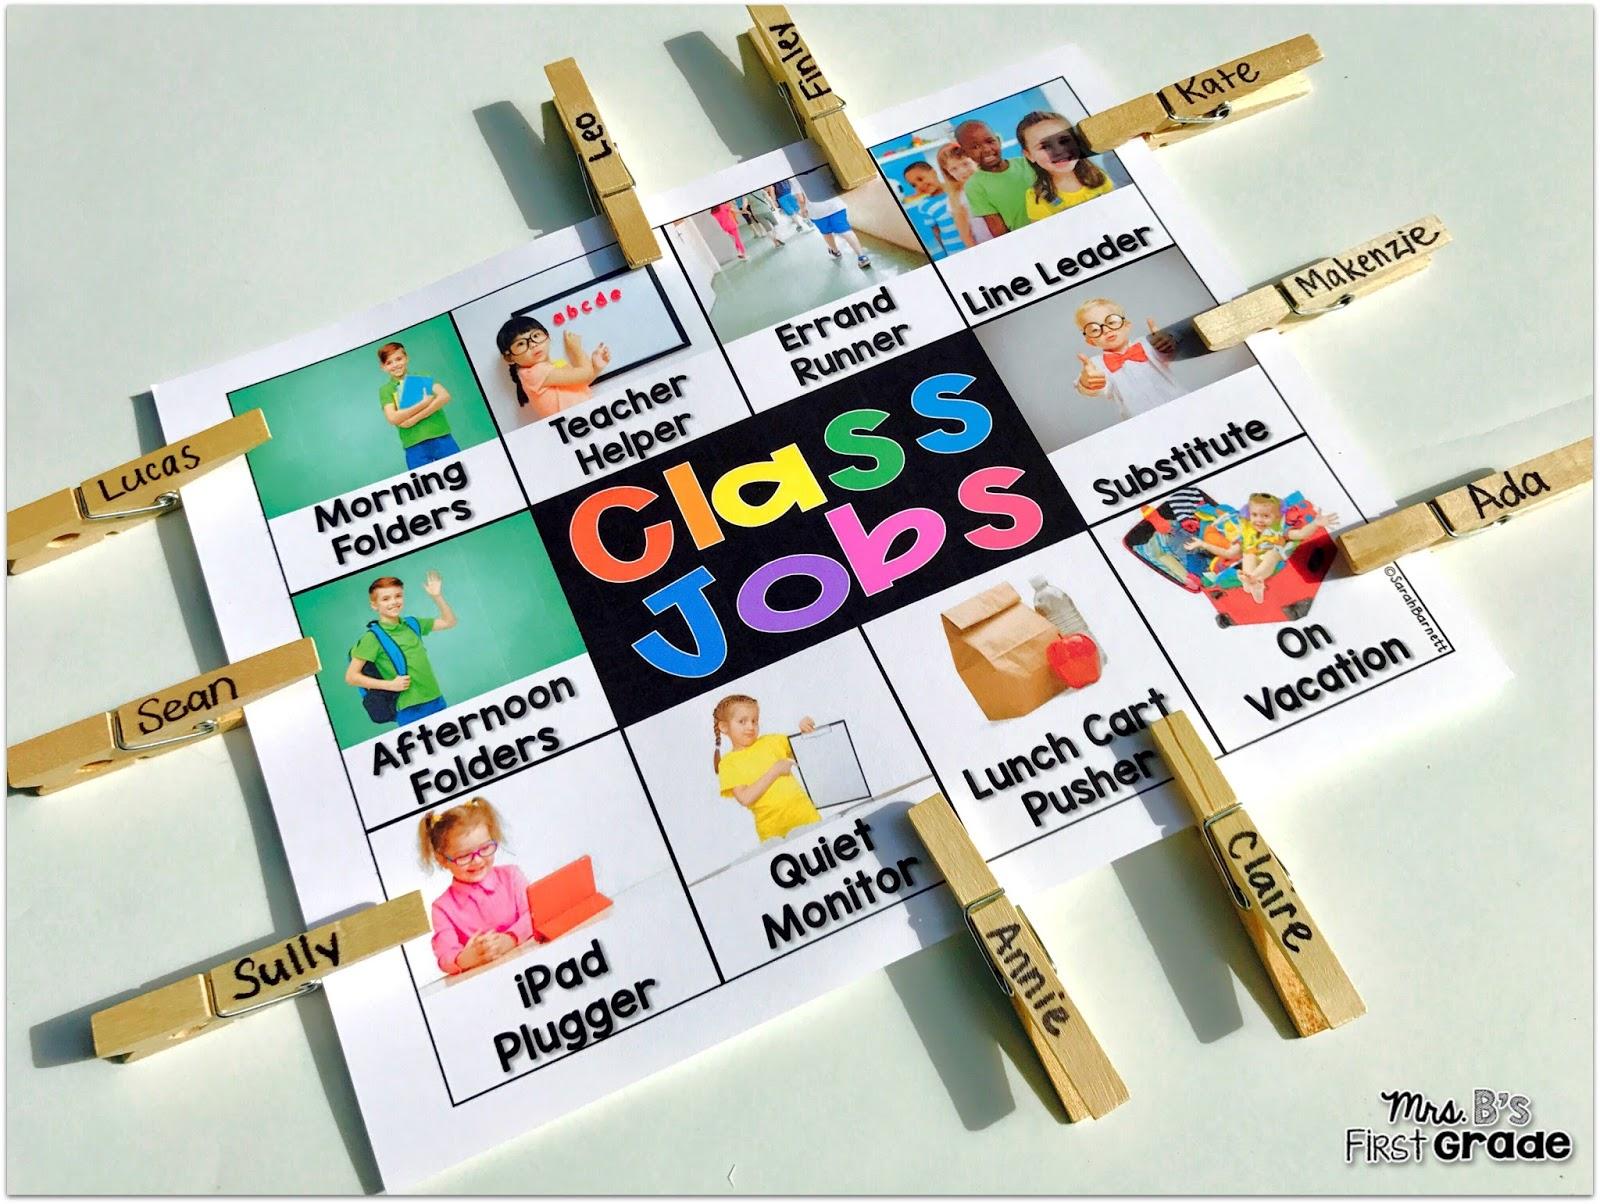 Classroom Job Ideas 1st Grade ~ First grade classroom jobs mrs b s